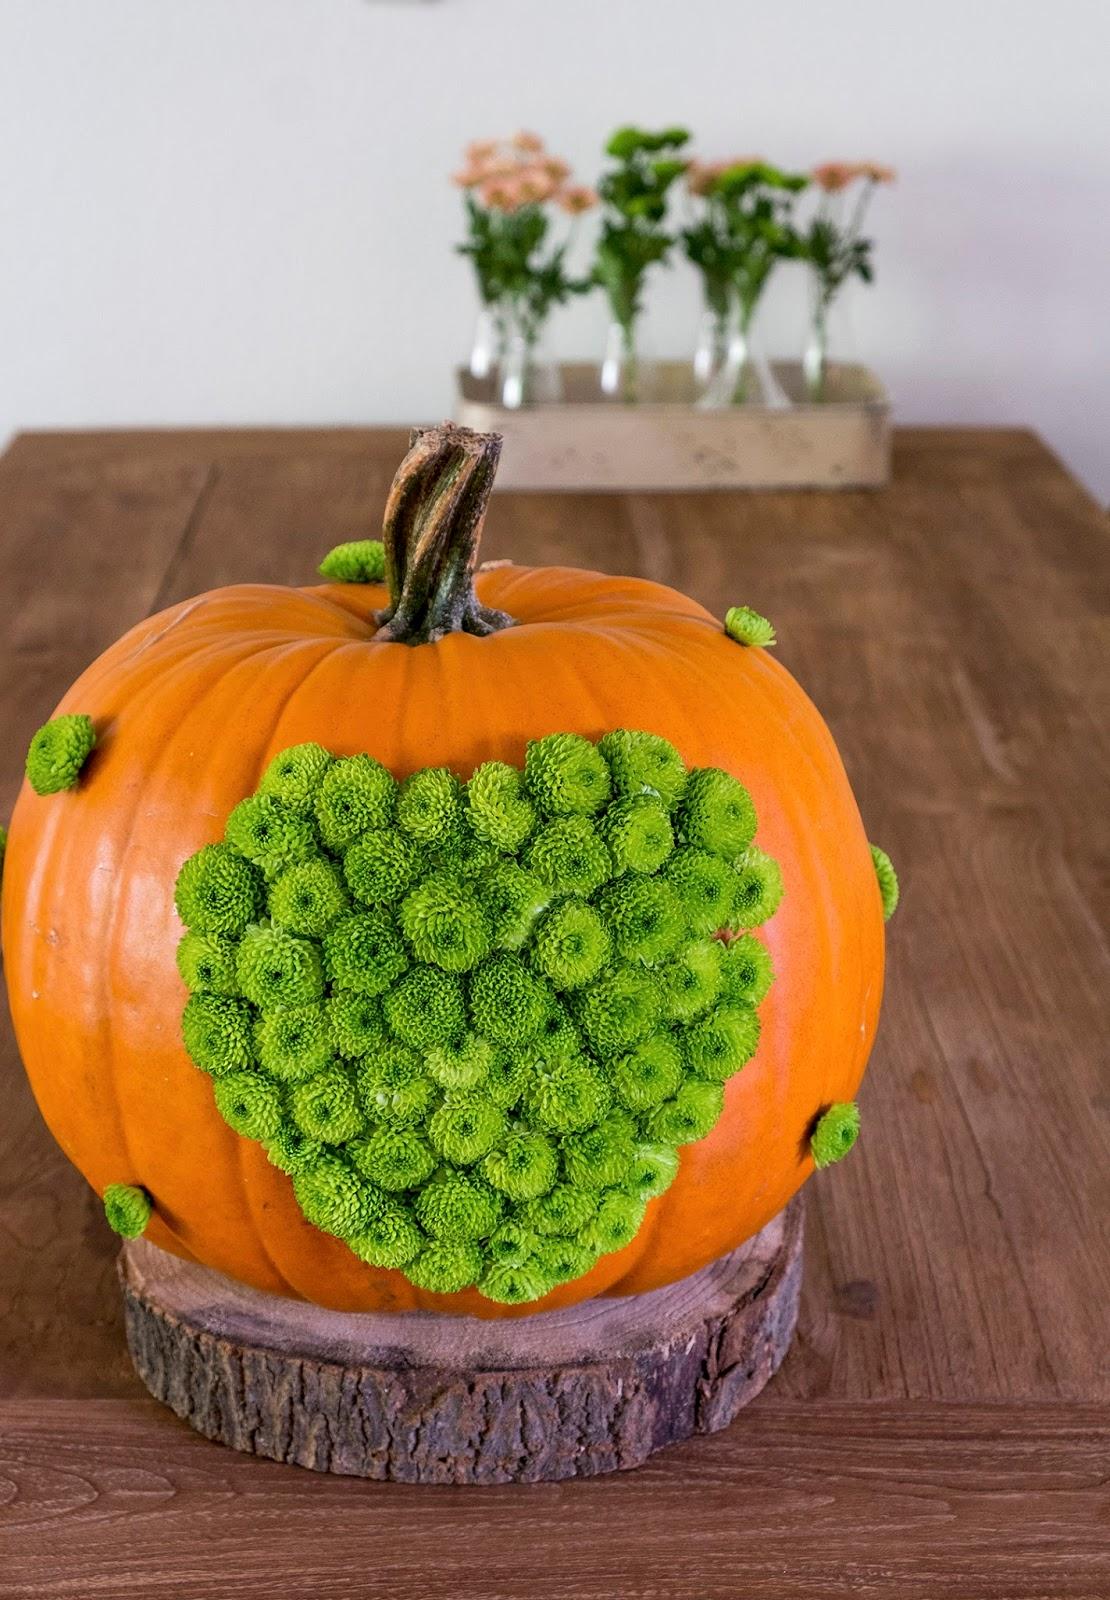 DIY orange pumpkin dotted with green mums